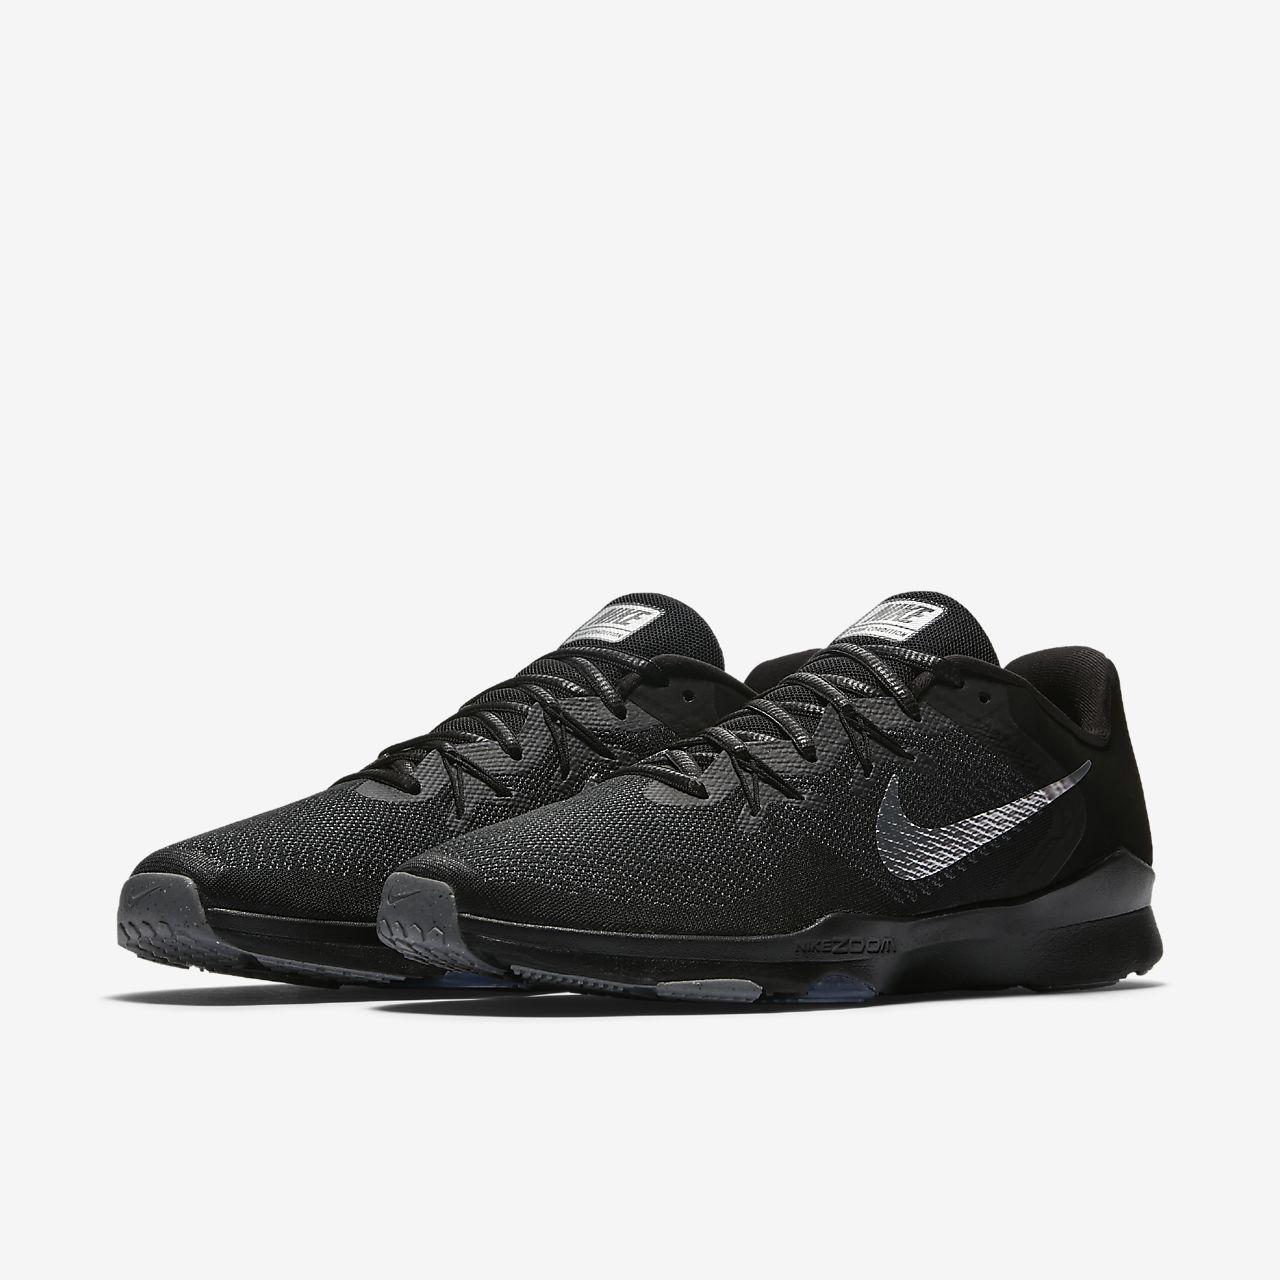 hot sales da788 6a1e7 ... Calzado de entrenamiento para mujer Nike Zoom Condition TR 2